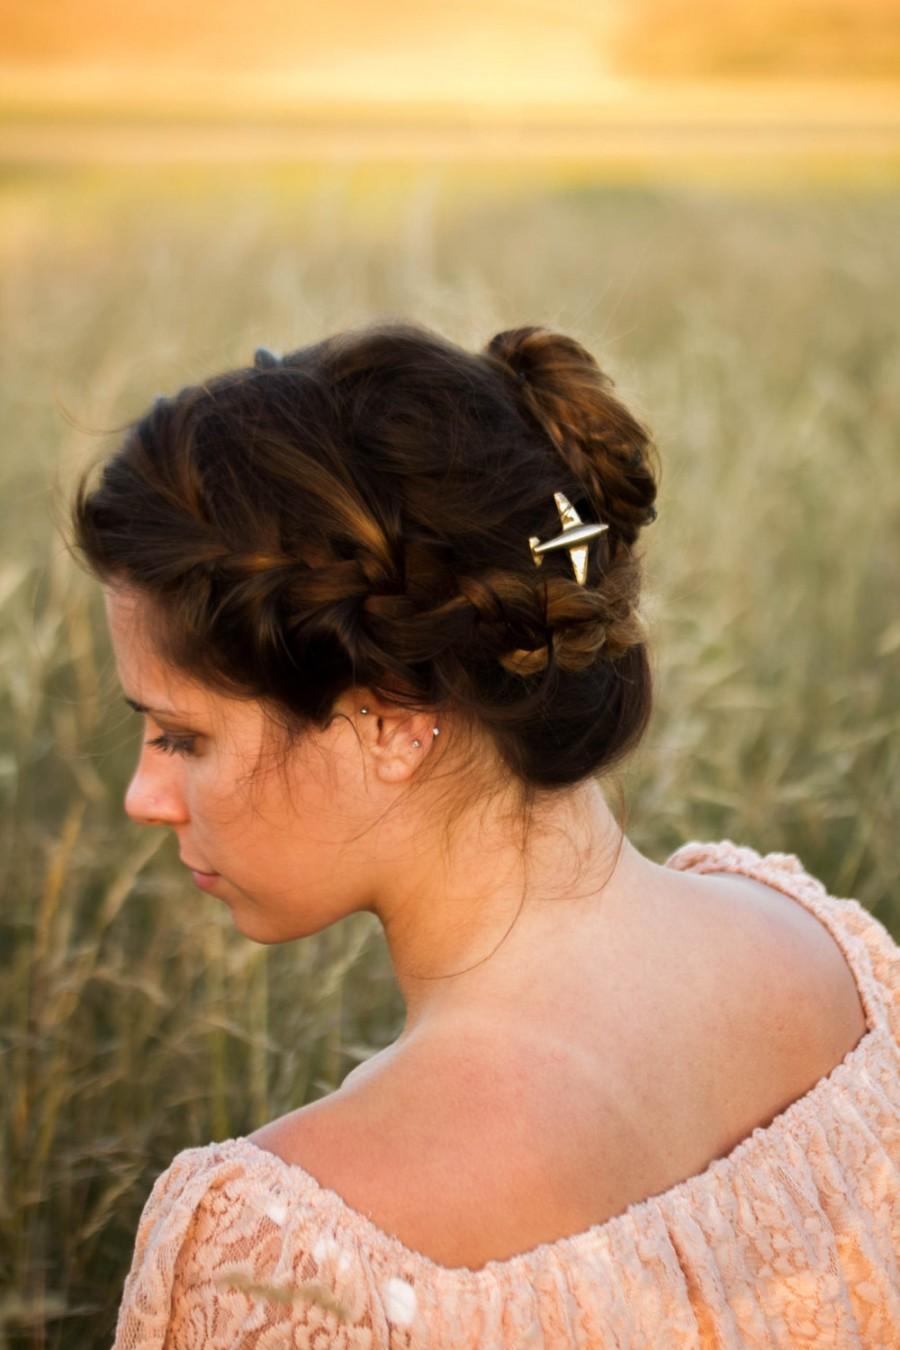 Mariage - Gold Airplane Hair Pins, Plane Hair Clip, Airplane Bobby Pins , Aeroplane Hair Grips, Pilot Hair Pin,  Flight Attendant Gift, Gift For Pilot